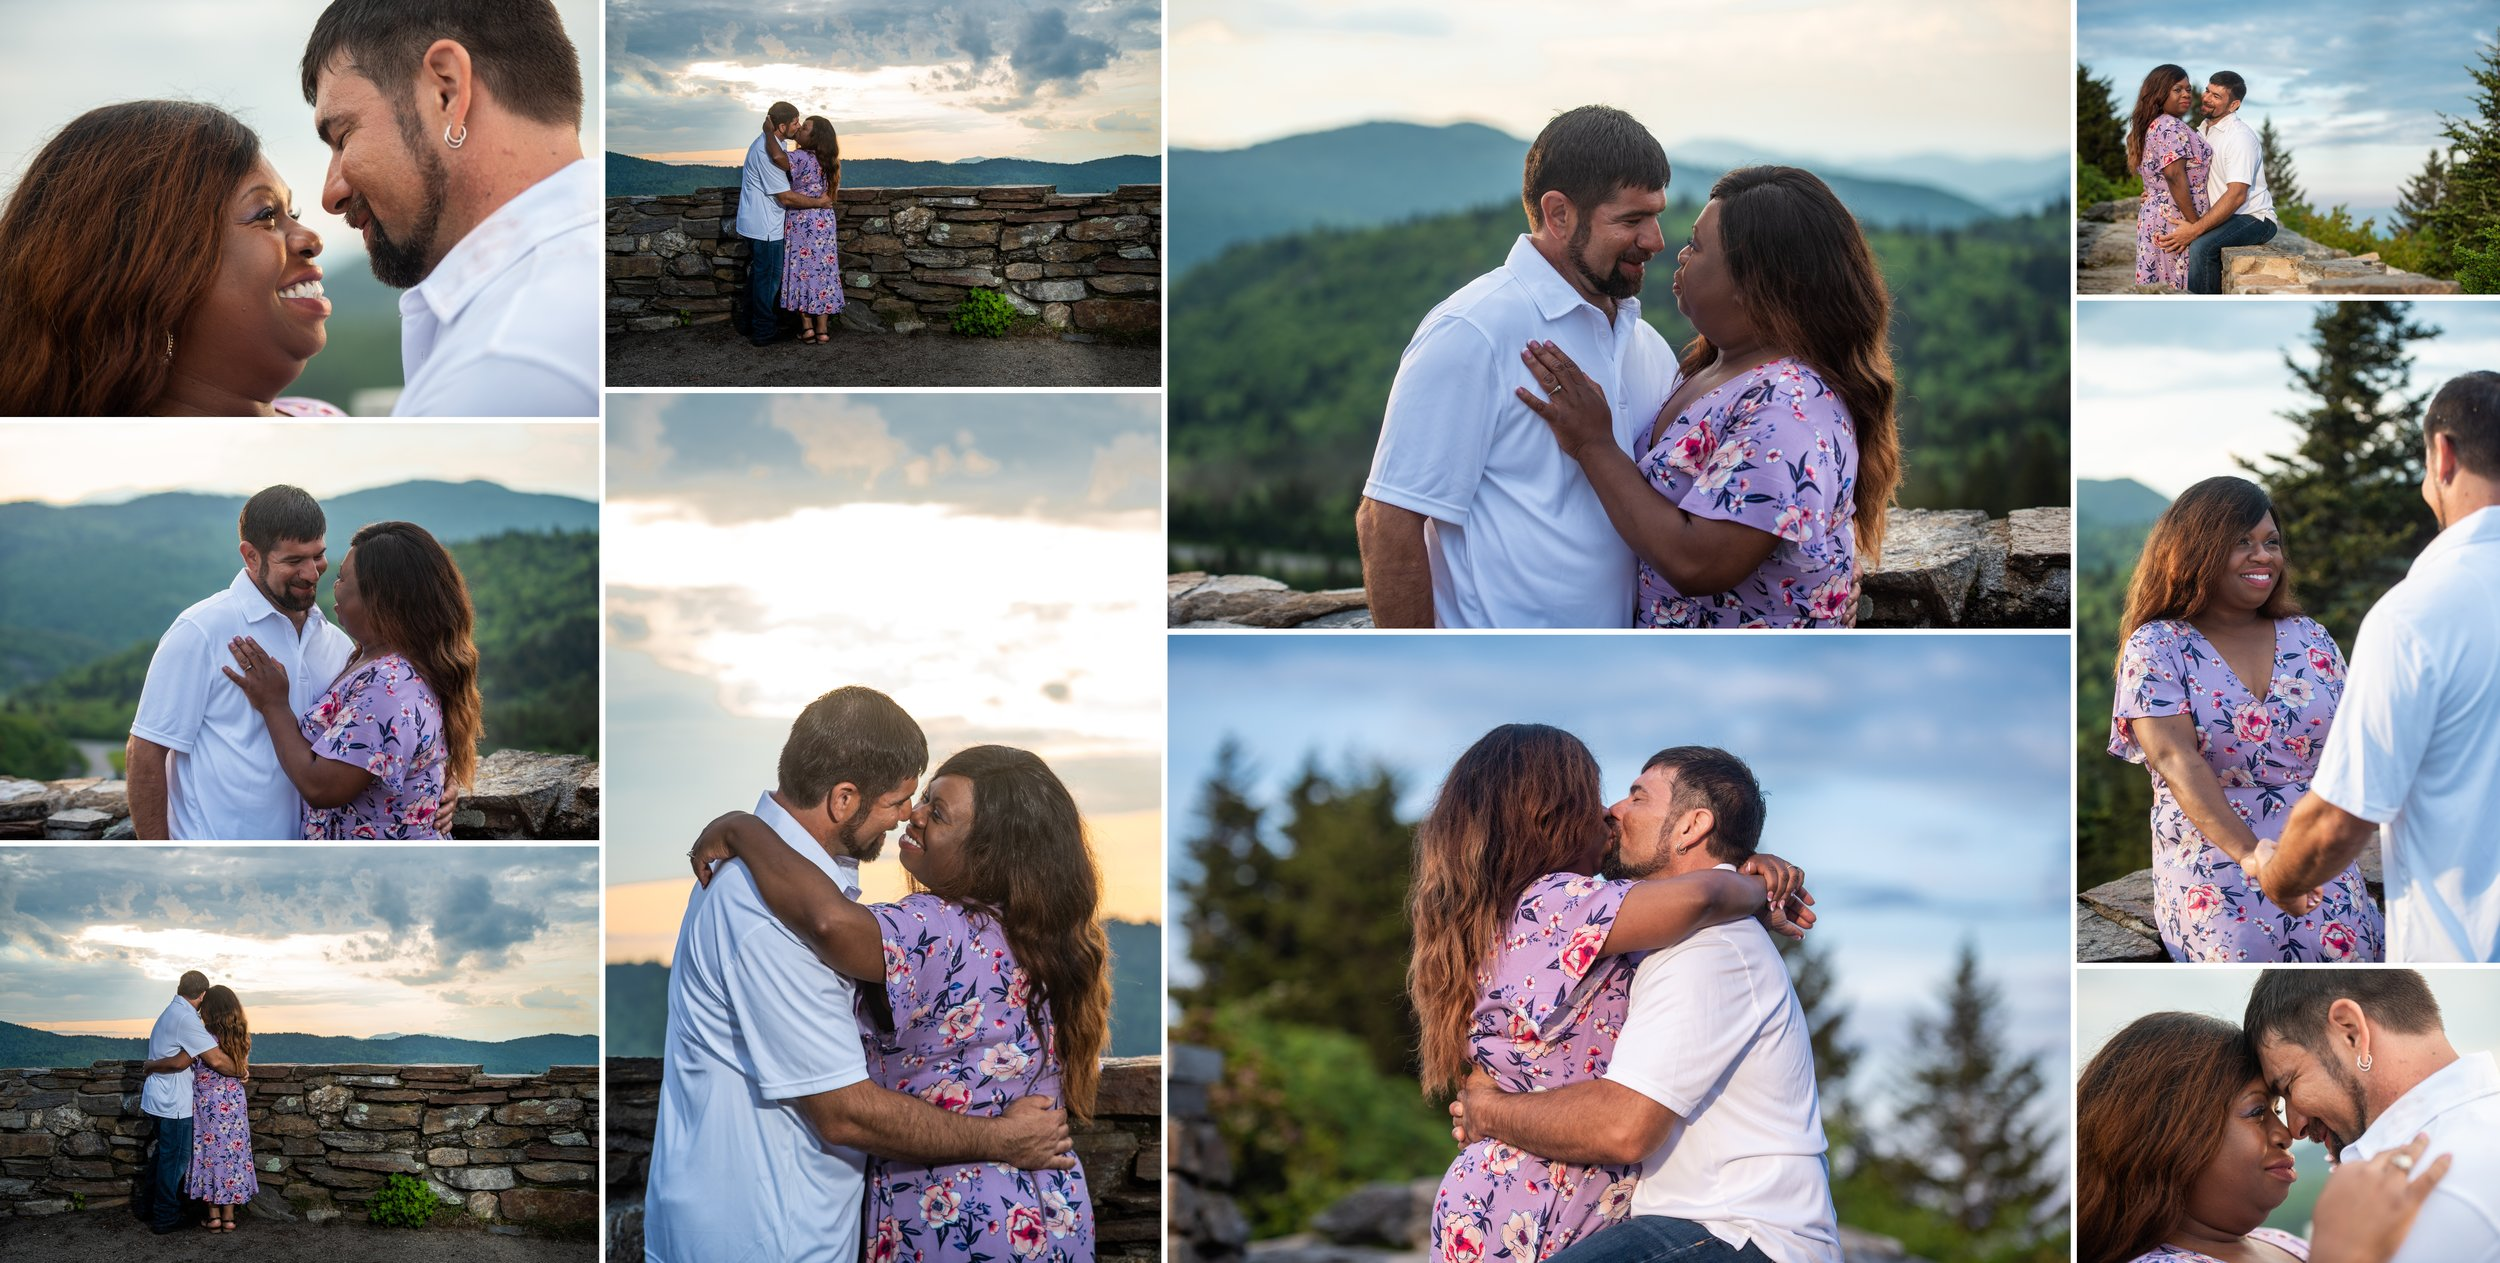 Adventure Engagement Photoshoot on the Blue Ridge Parkway